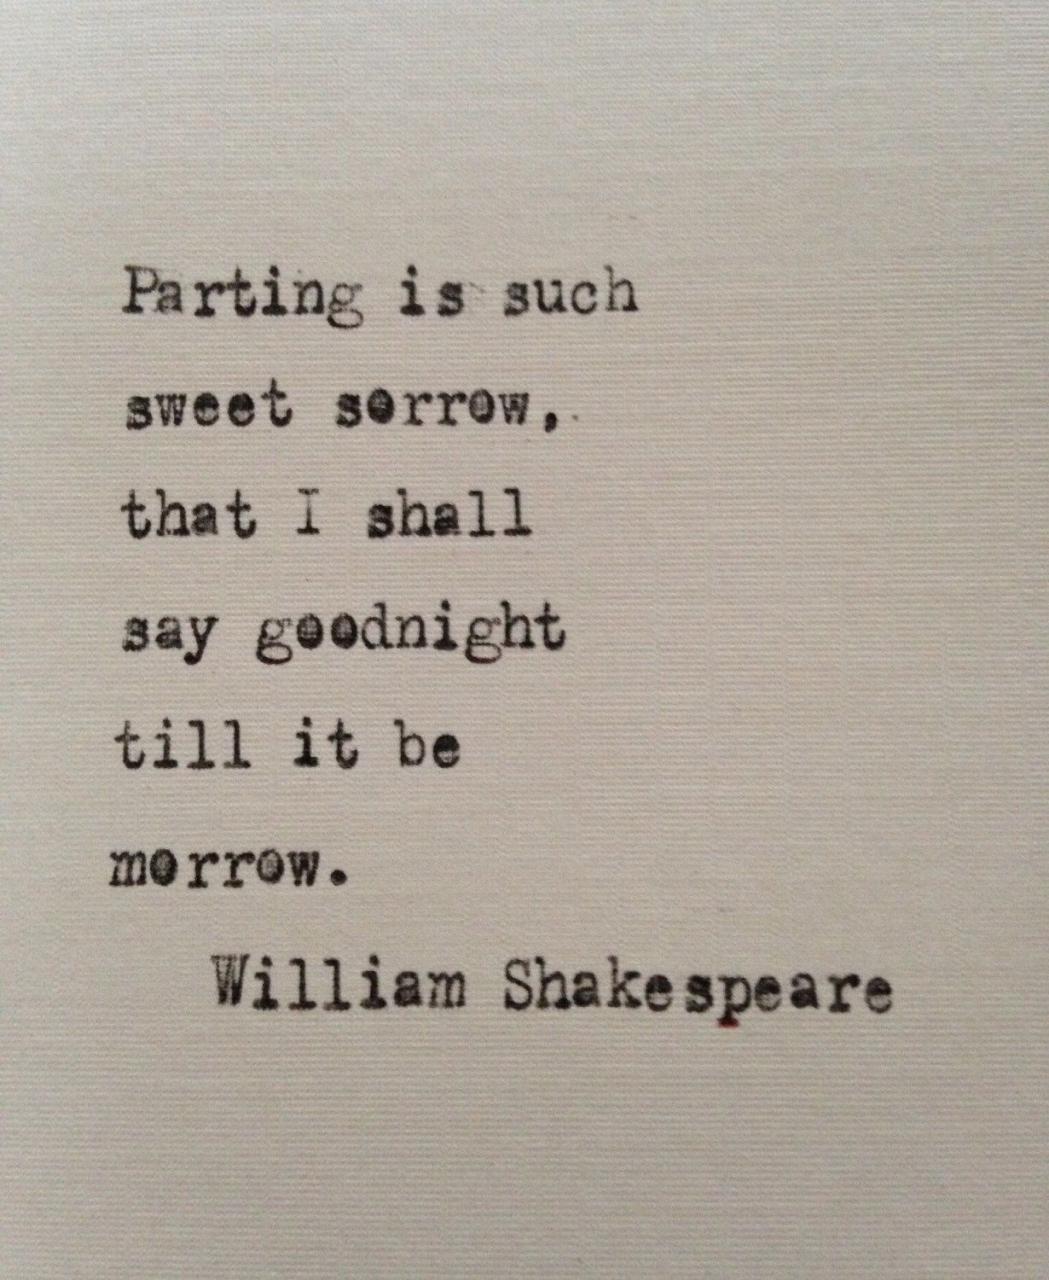 William Shakespeare Love Quote Romeo And Juliet Hand Typed On Antique Typewriter Gift Girlfriend Boyfriend Husband